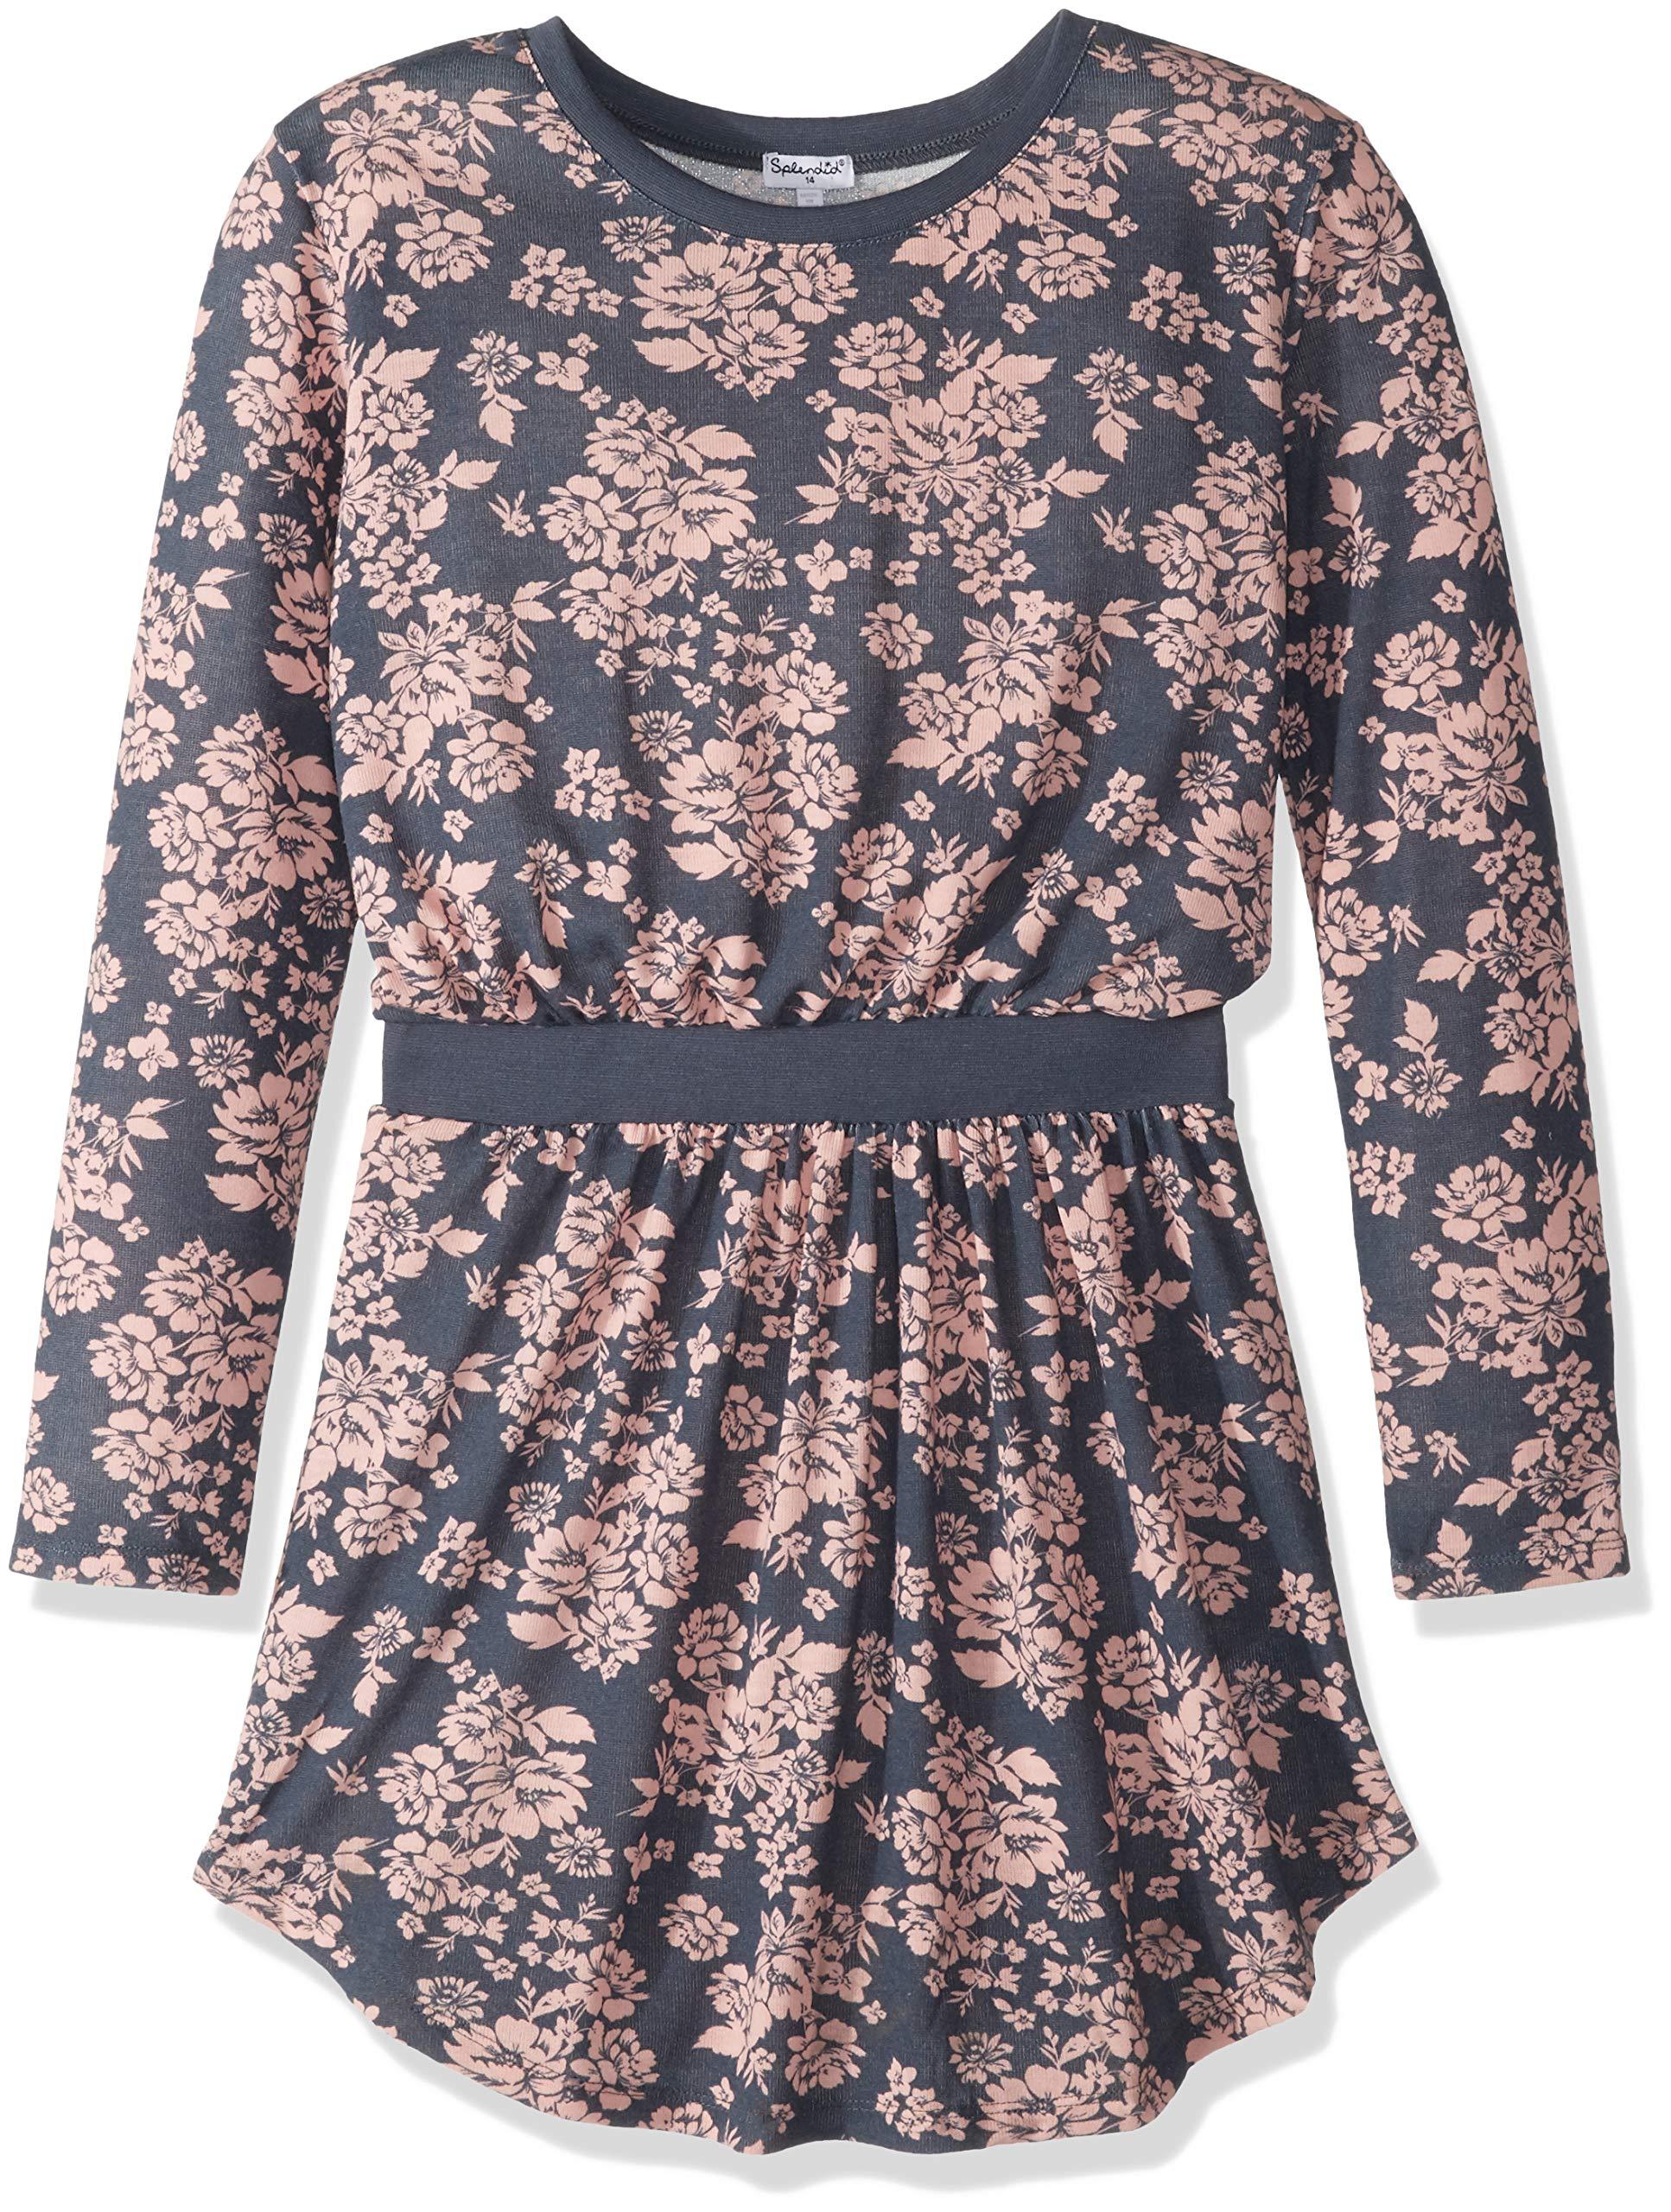 Splendid Girls' Toddler Floral Dress, Ombre Blue, 3T